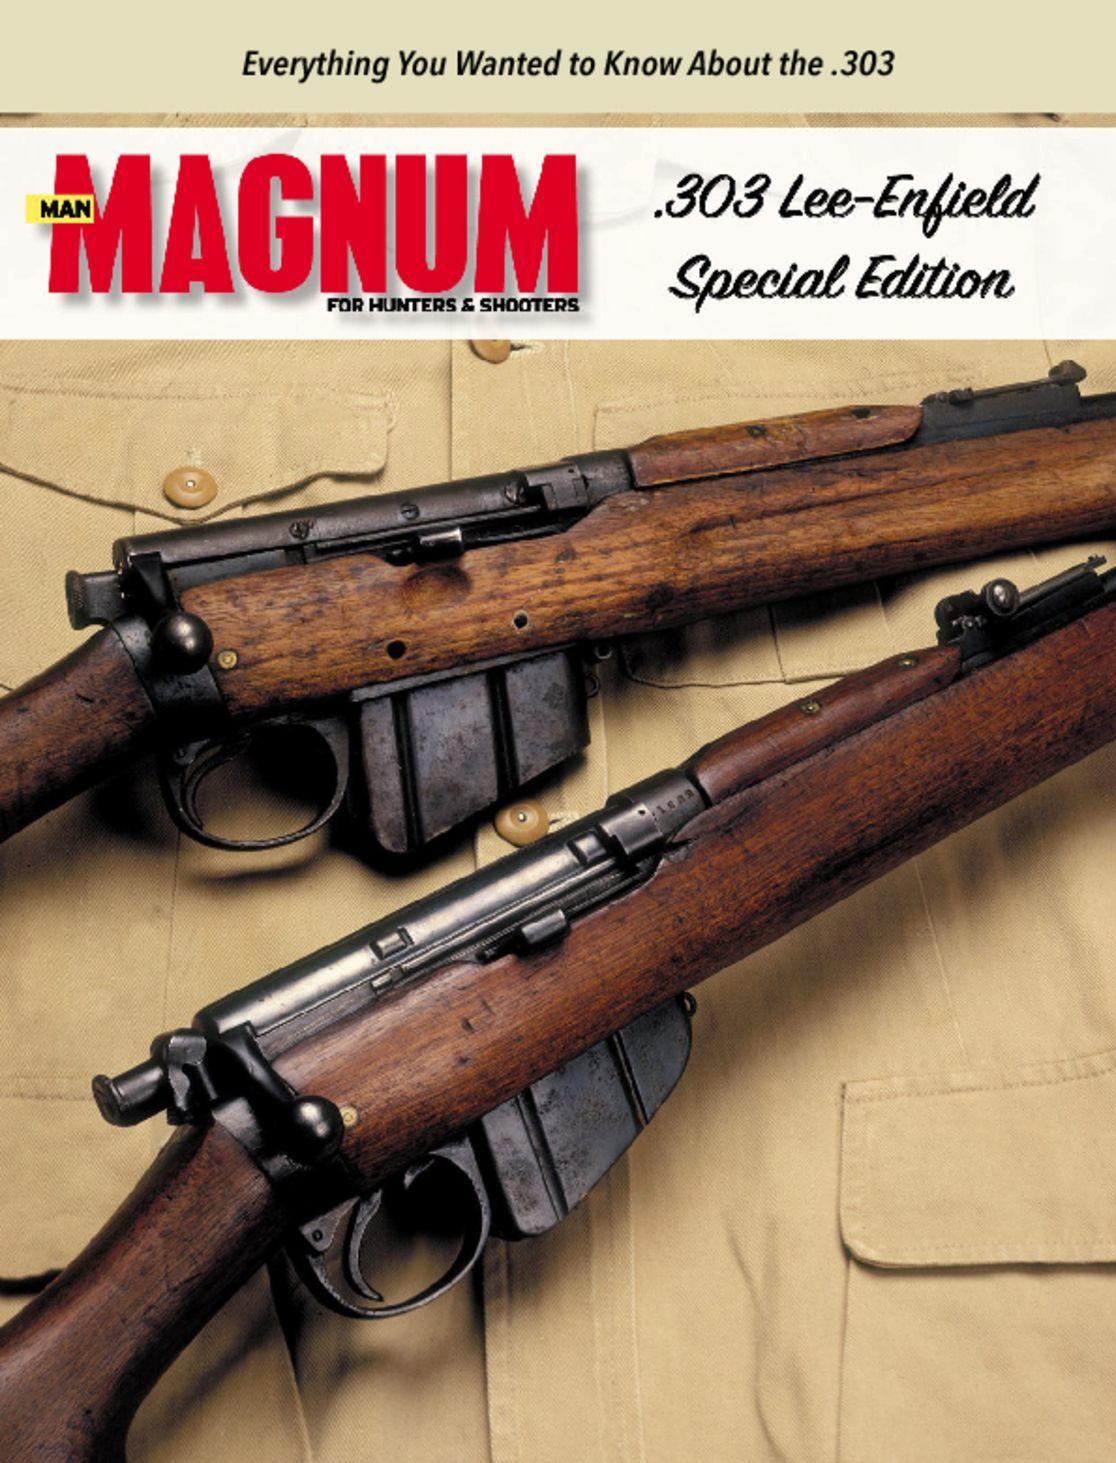 Man Magnum 303 Digital